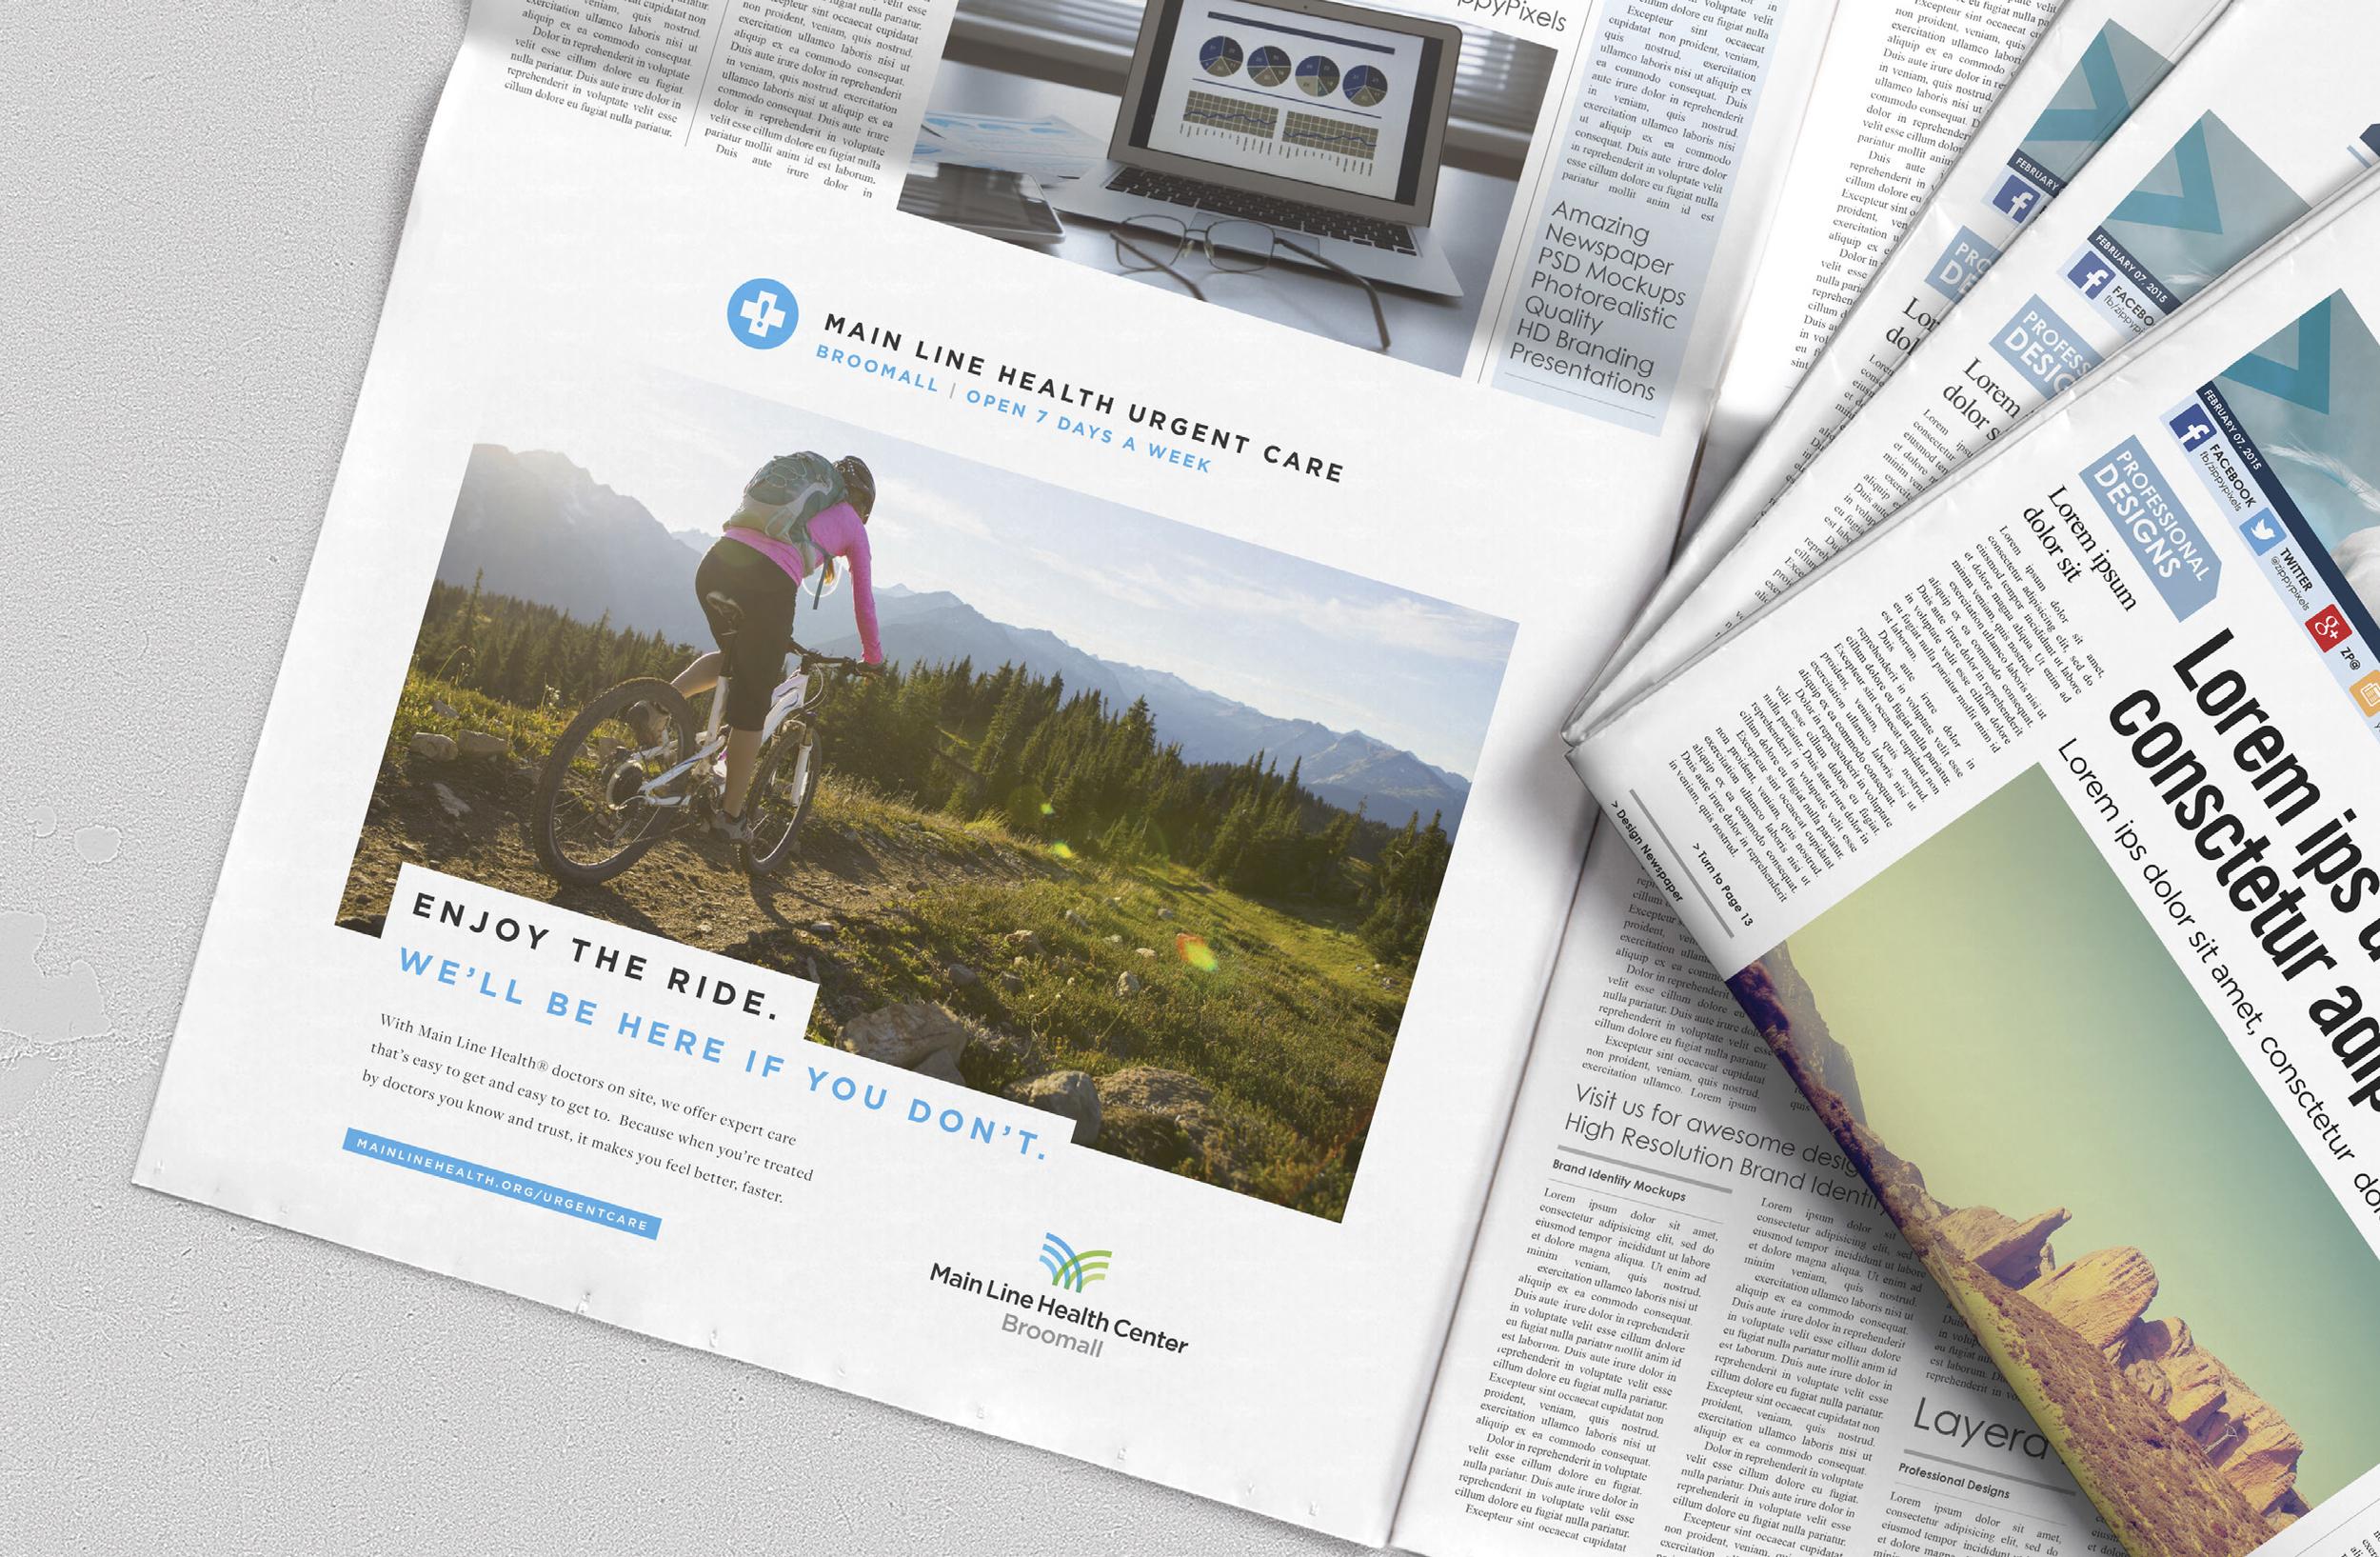 Enjoy the ride newspaper.jpg